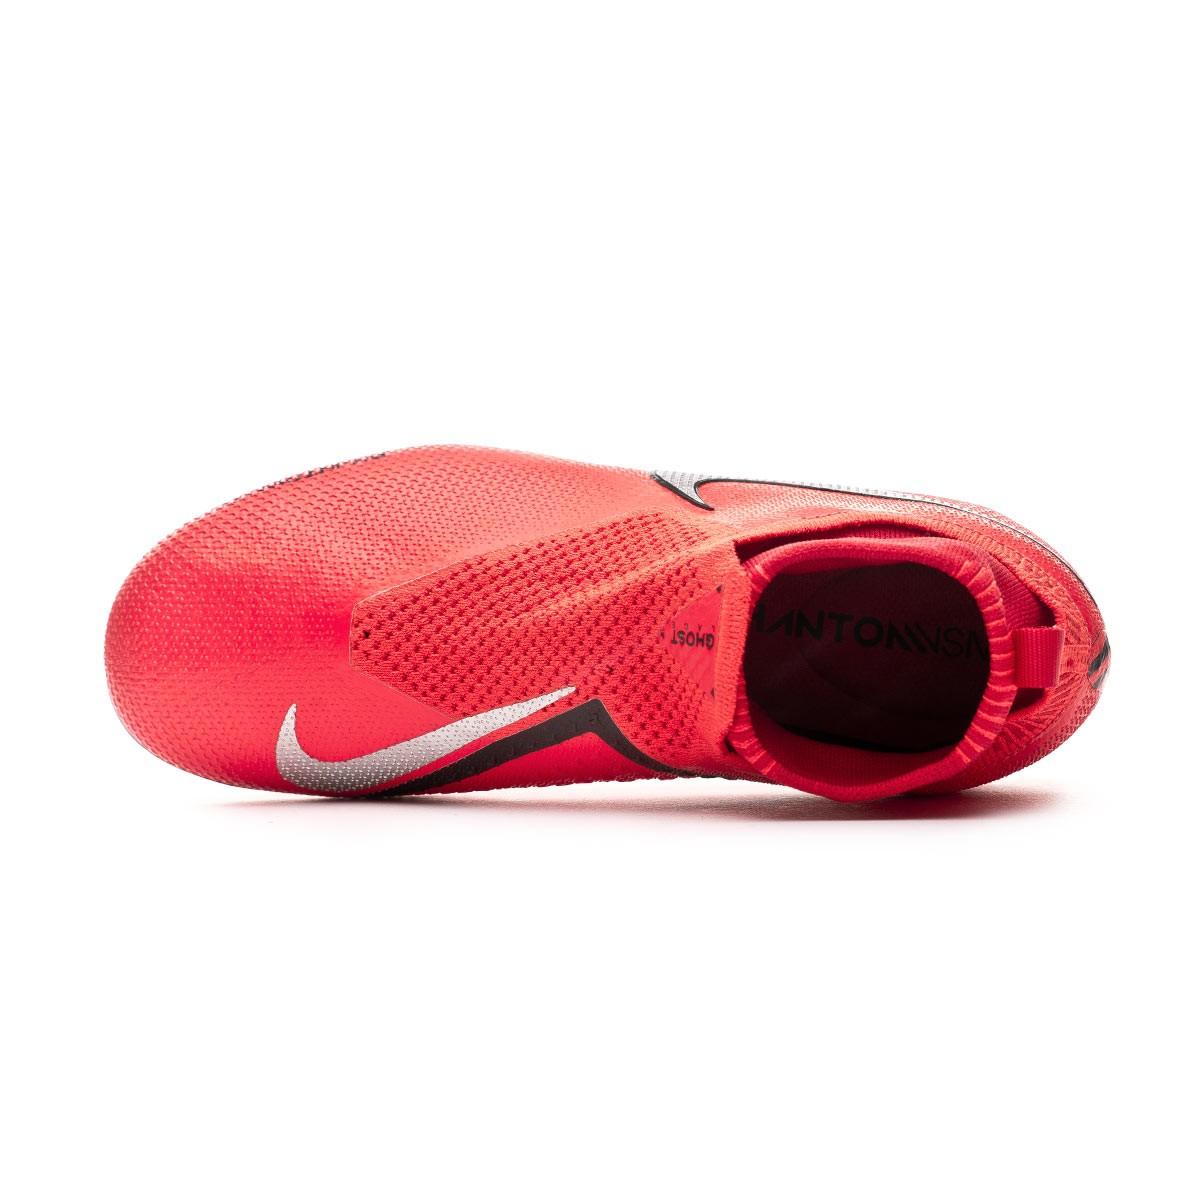 cefdb0d6d Football Boots Nike Kids Phantom Vision Elite DF FG/MG Bright  crimson-Metallic silver - Tienda de fútbol Fútbol Emotion